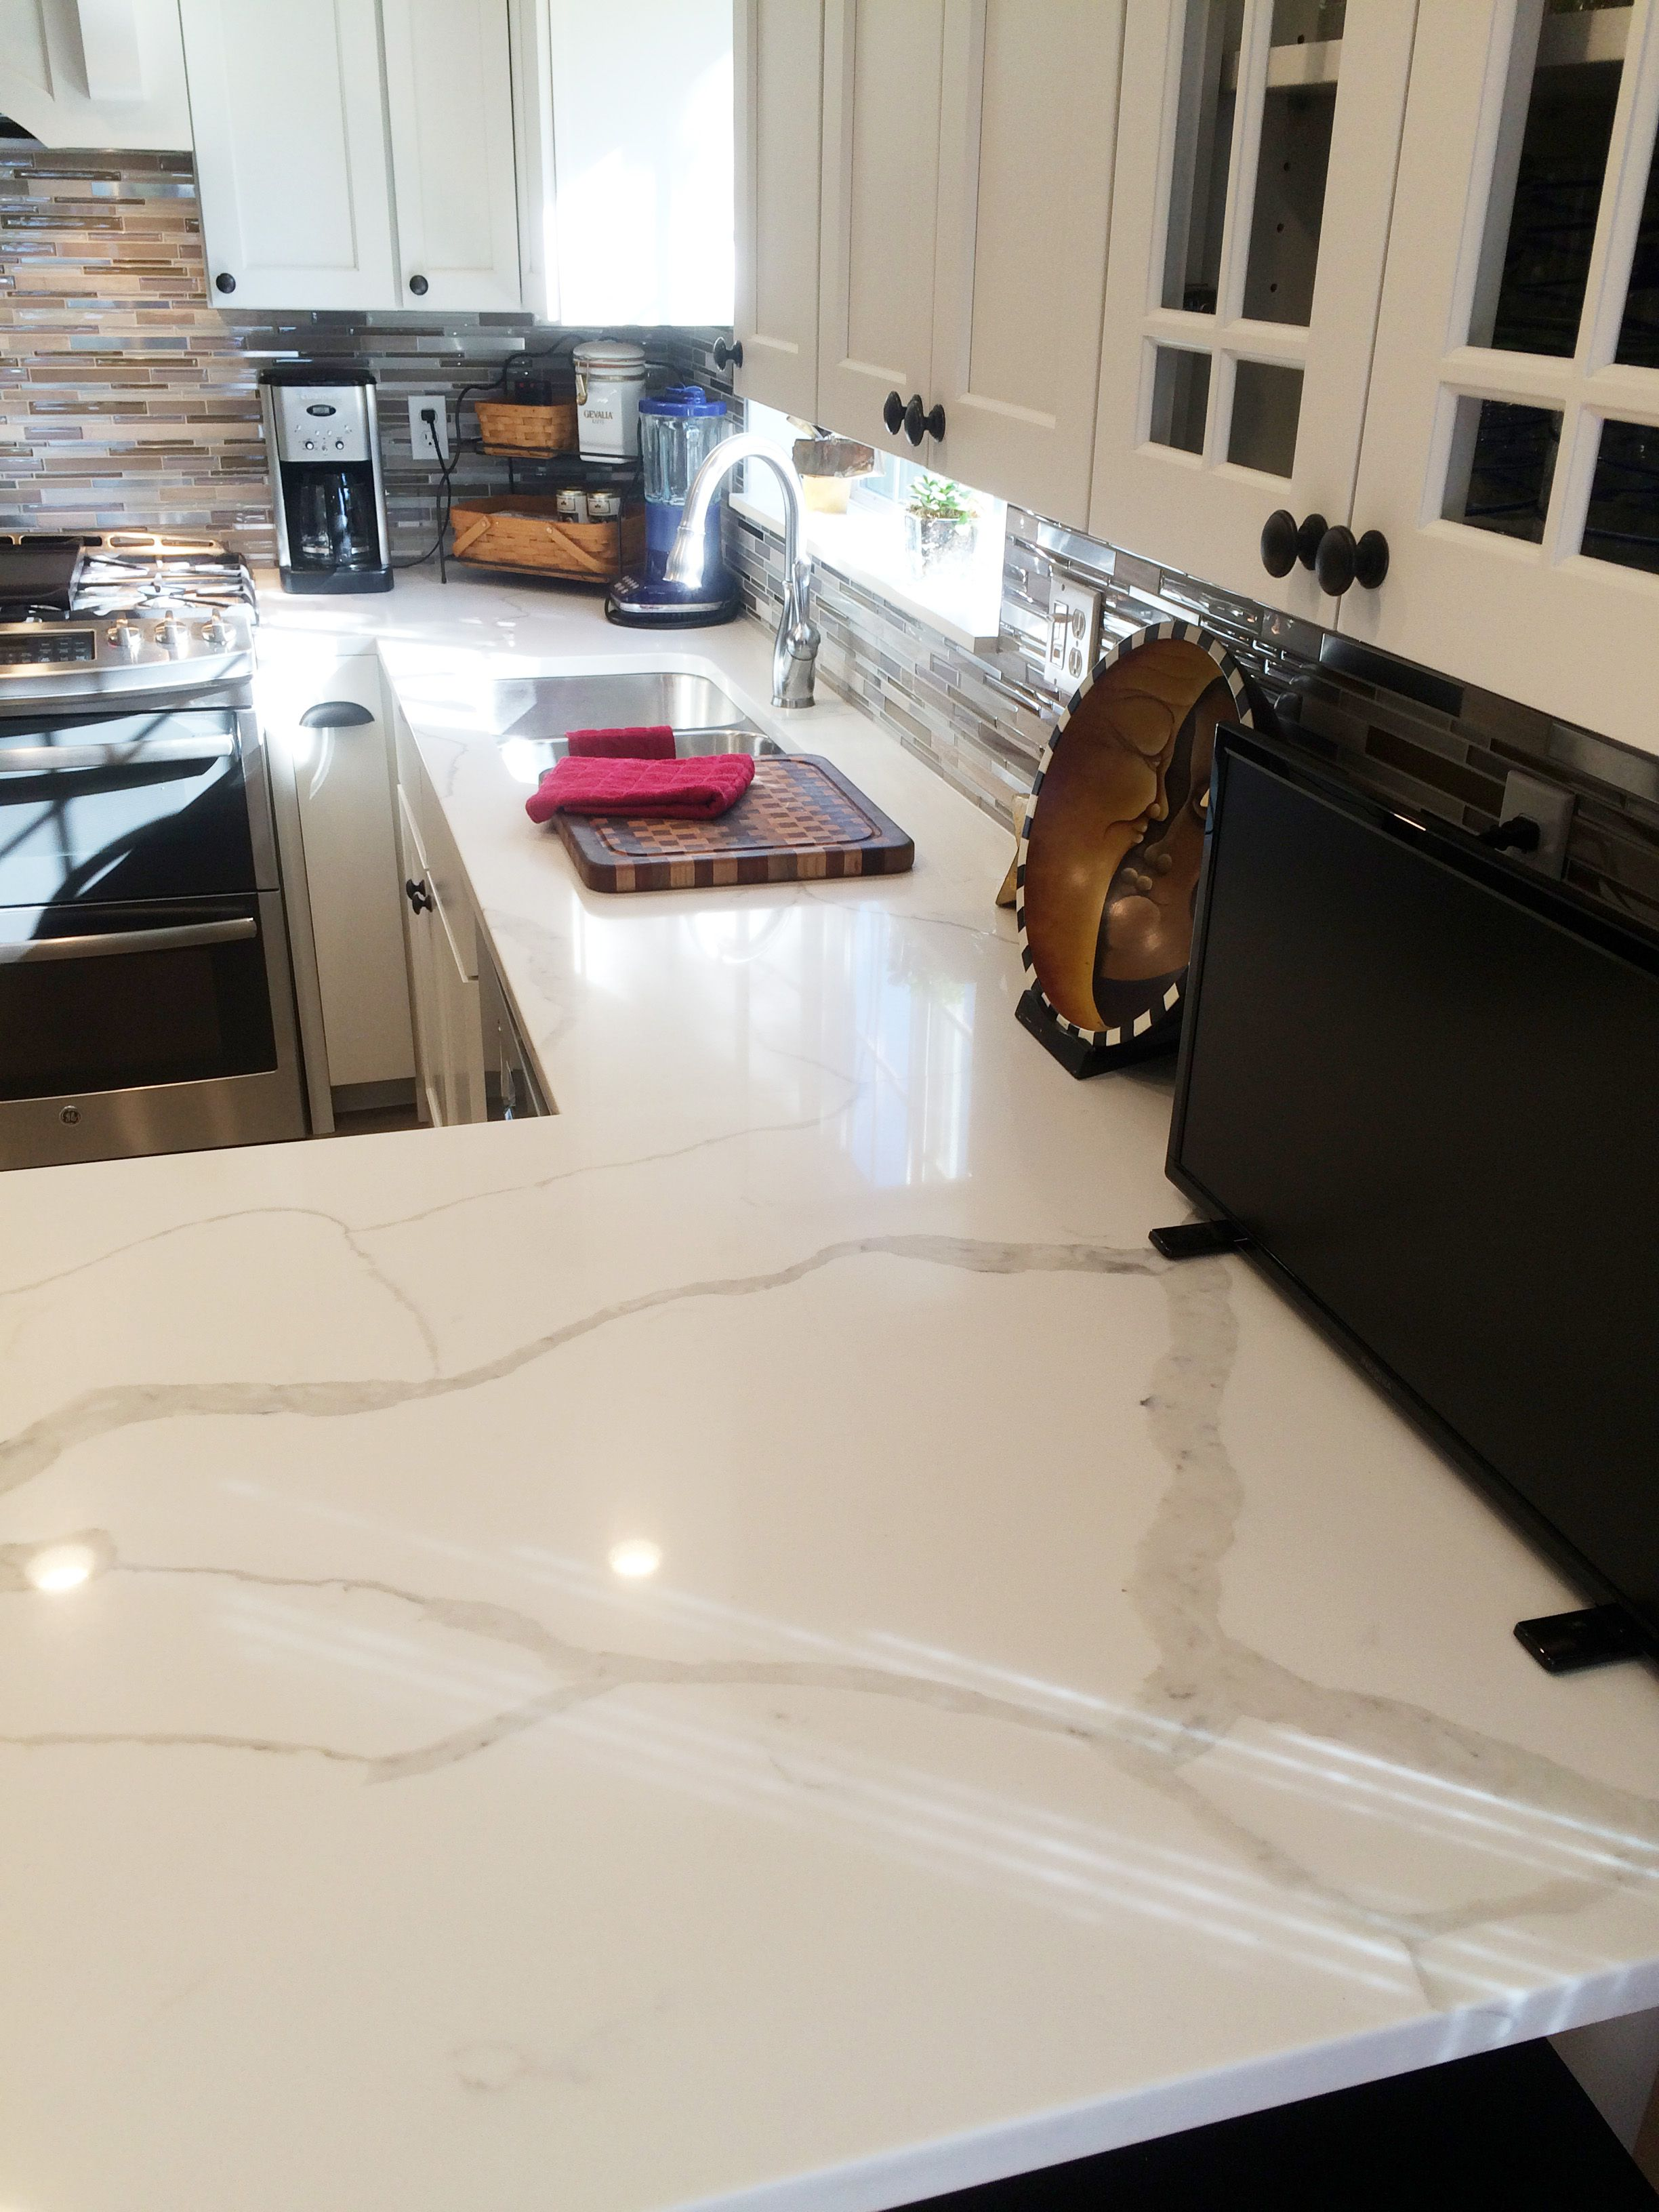 Quartz Kitchen Countertops What To Use Clean Wood Cabinets Colorquartz Calacatta Novus Counter